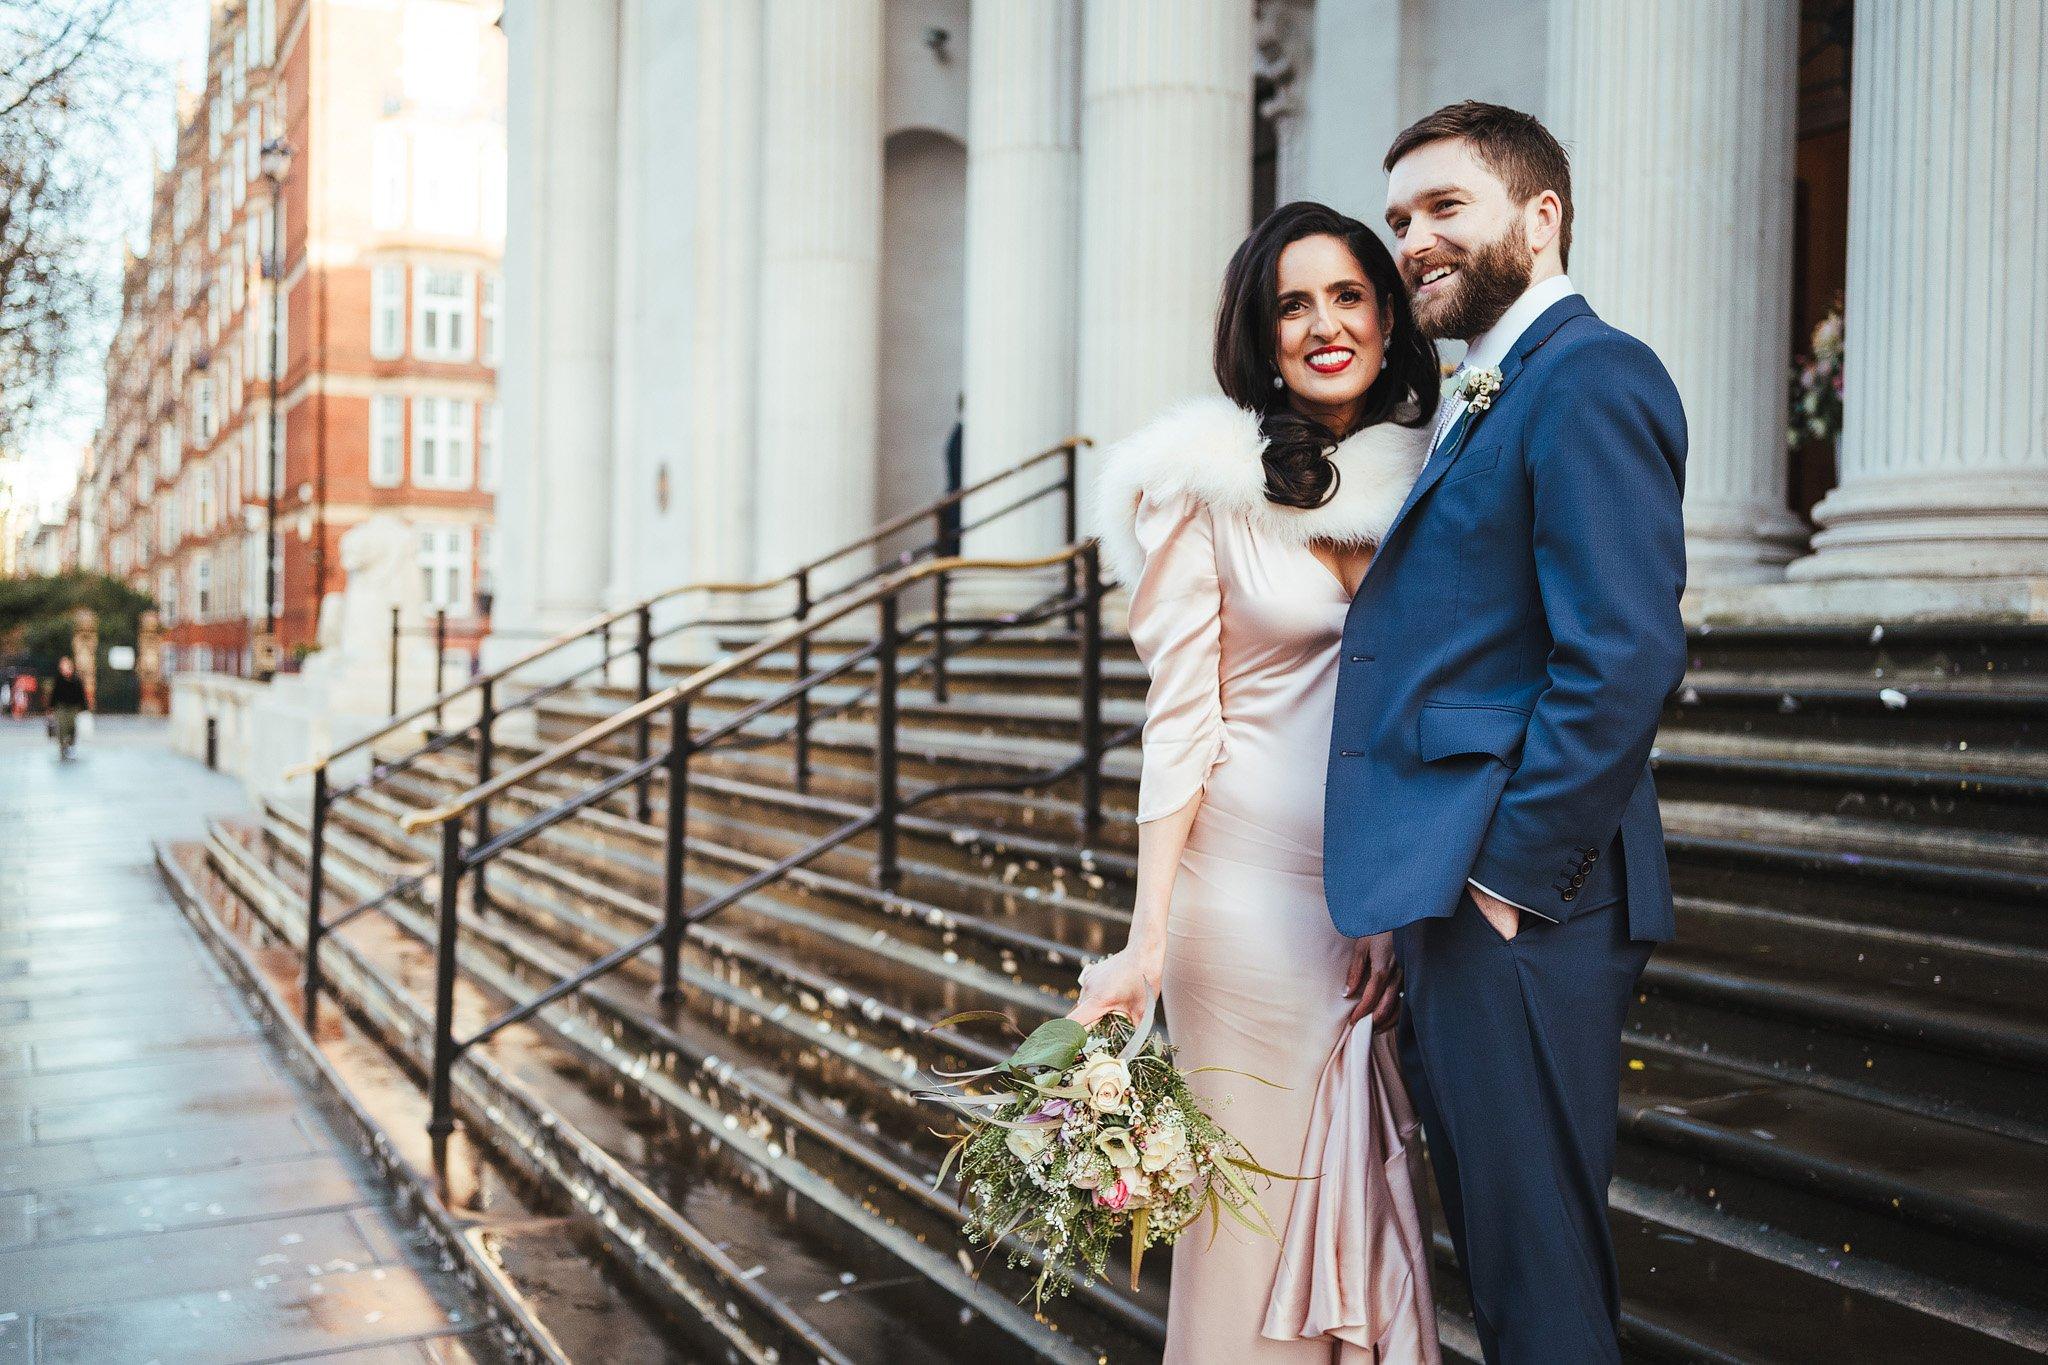 Wedding Photographer Of The Year 2020007